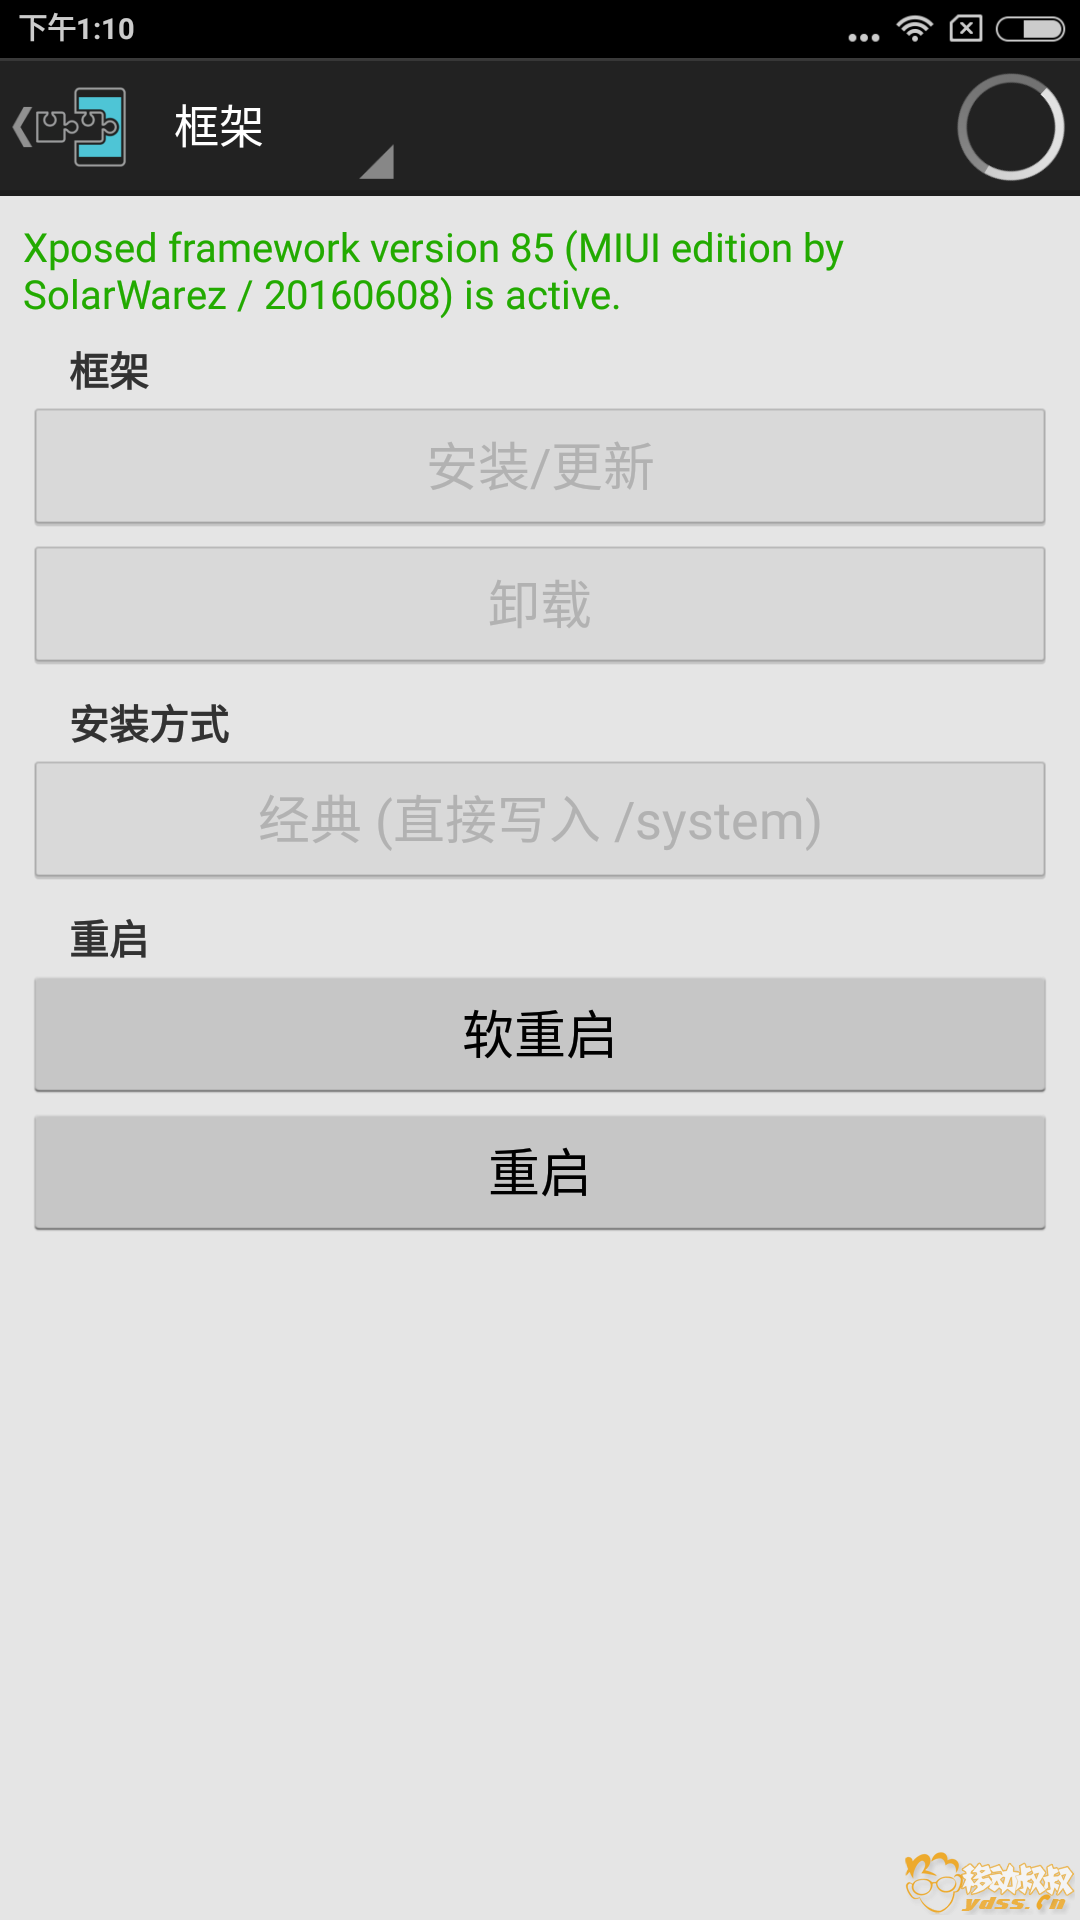 Screenshot_2017-11-29-13-10-56-156_de.robv.android.xposed.installer.png